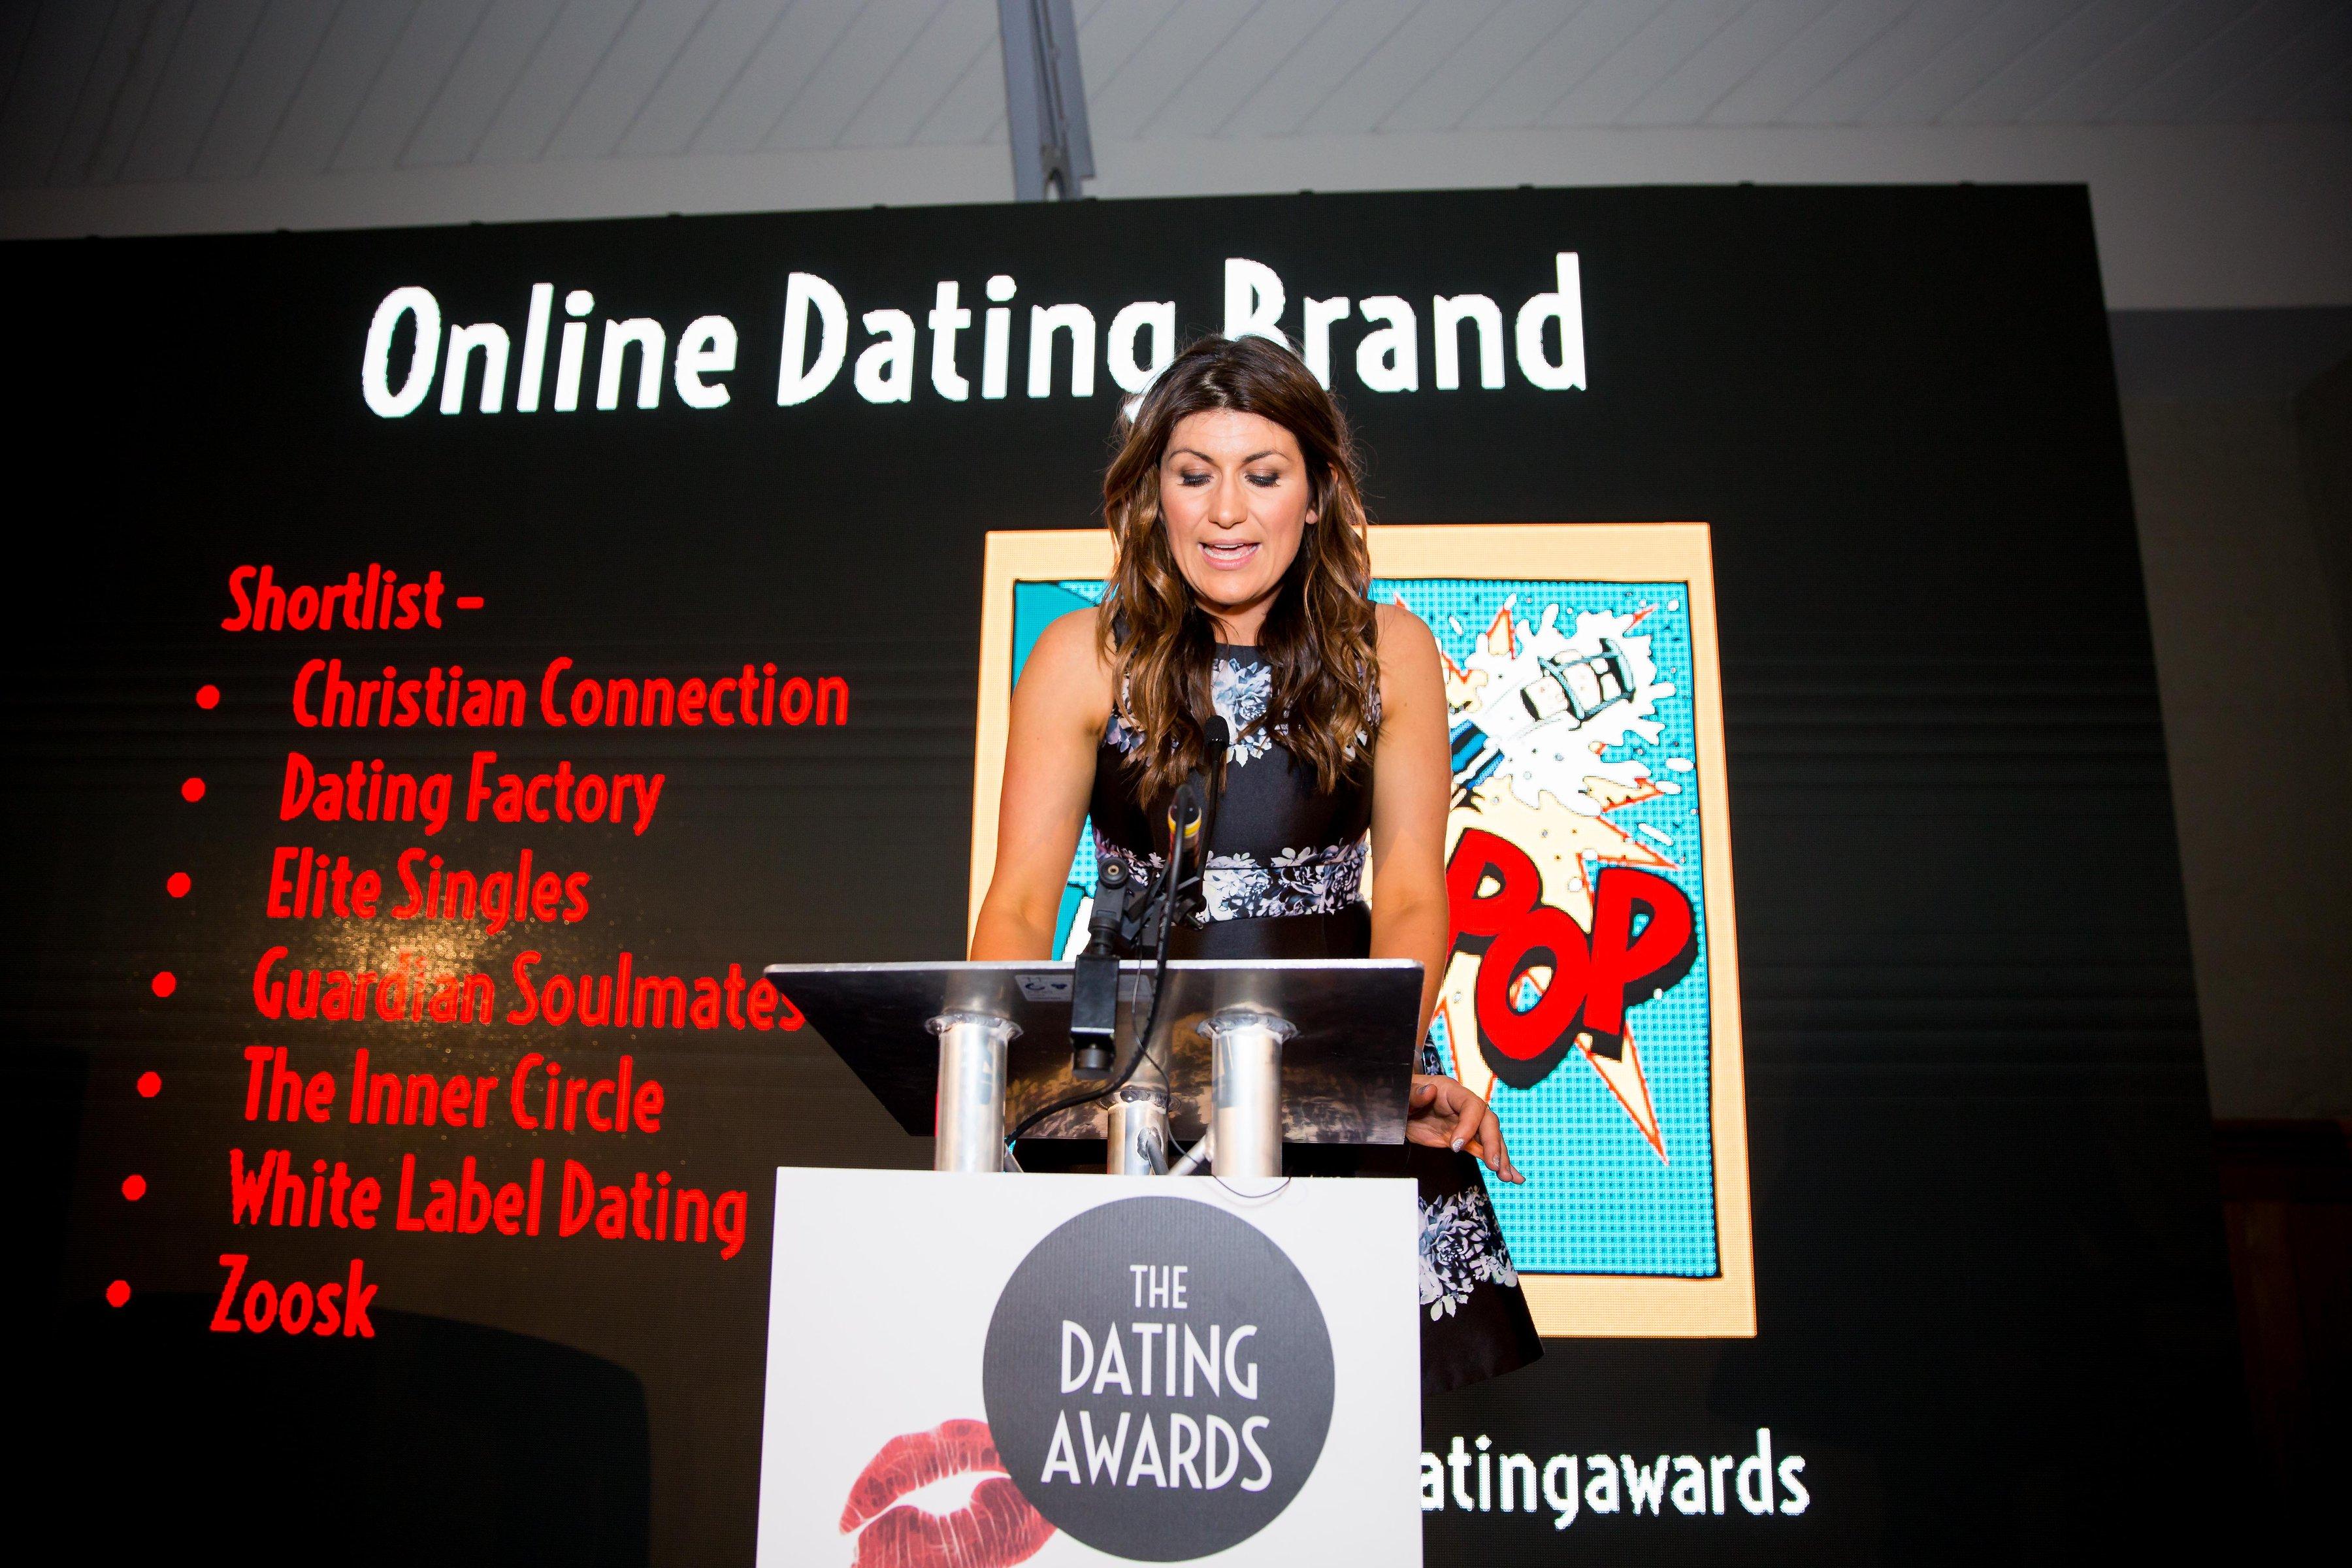 International online dating experts